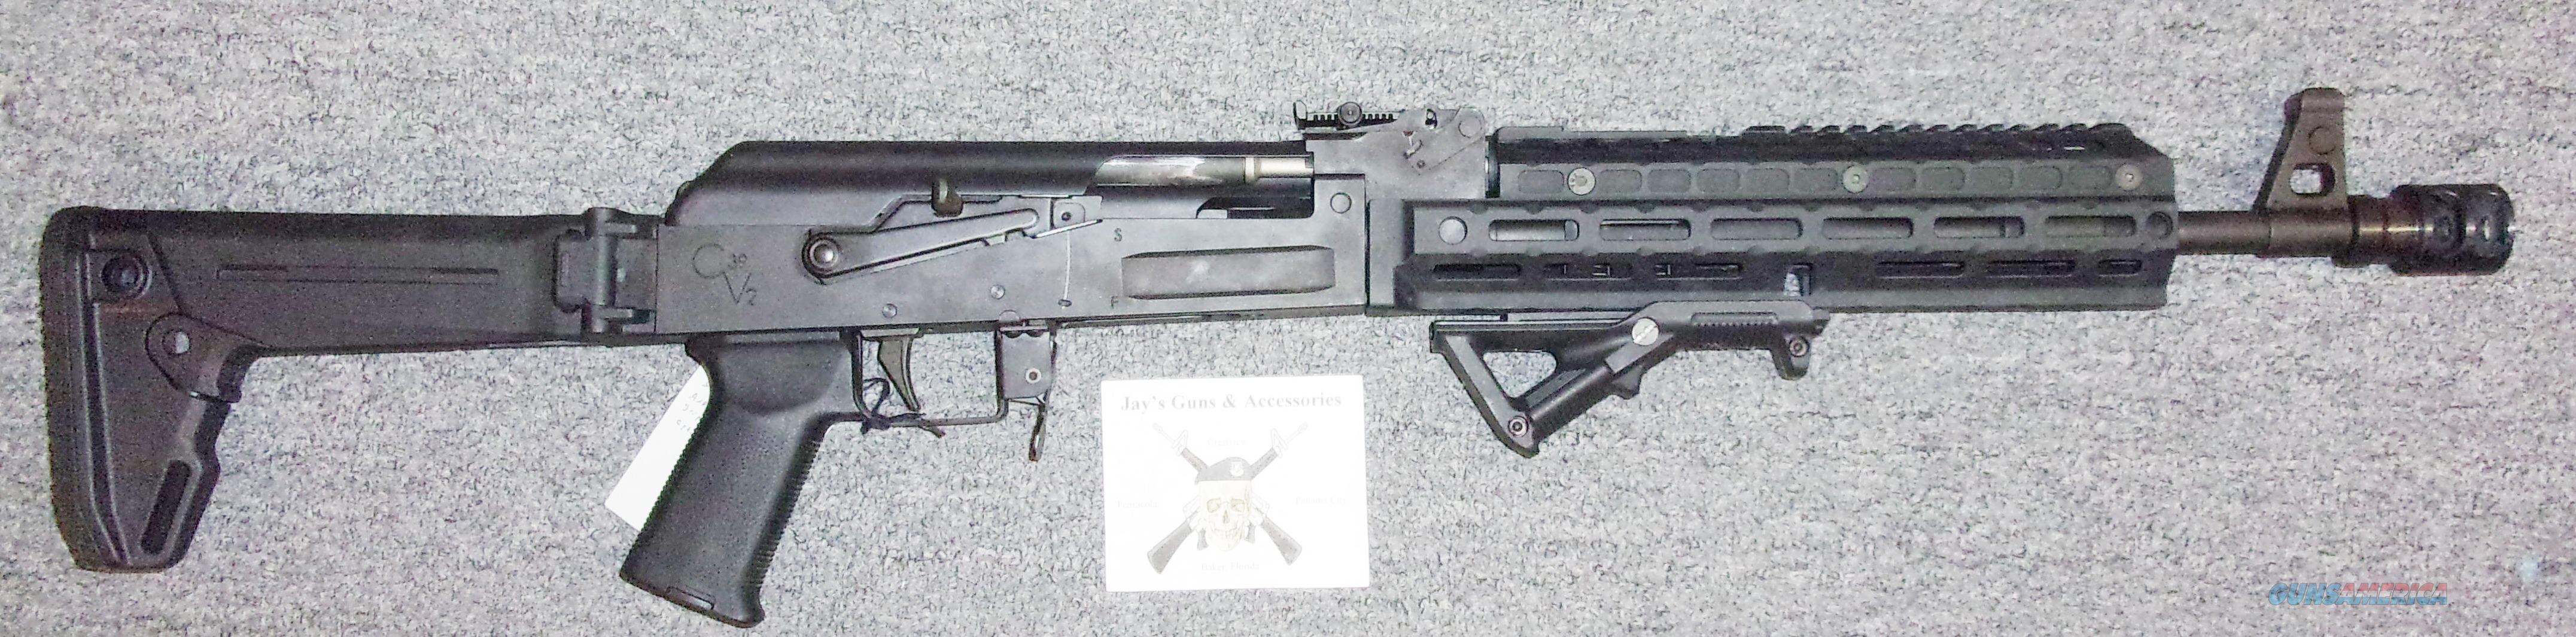 Century Arms C39V2 w/Milled Receiver  Guns > Rifles > Century International Arms - Rifles > Rifles